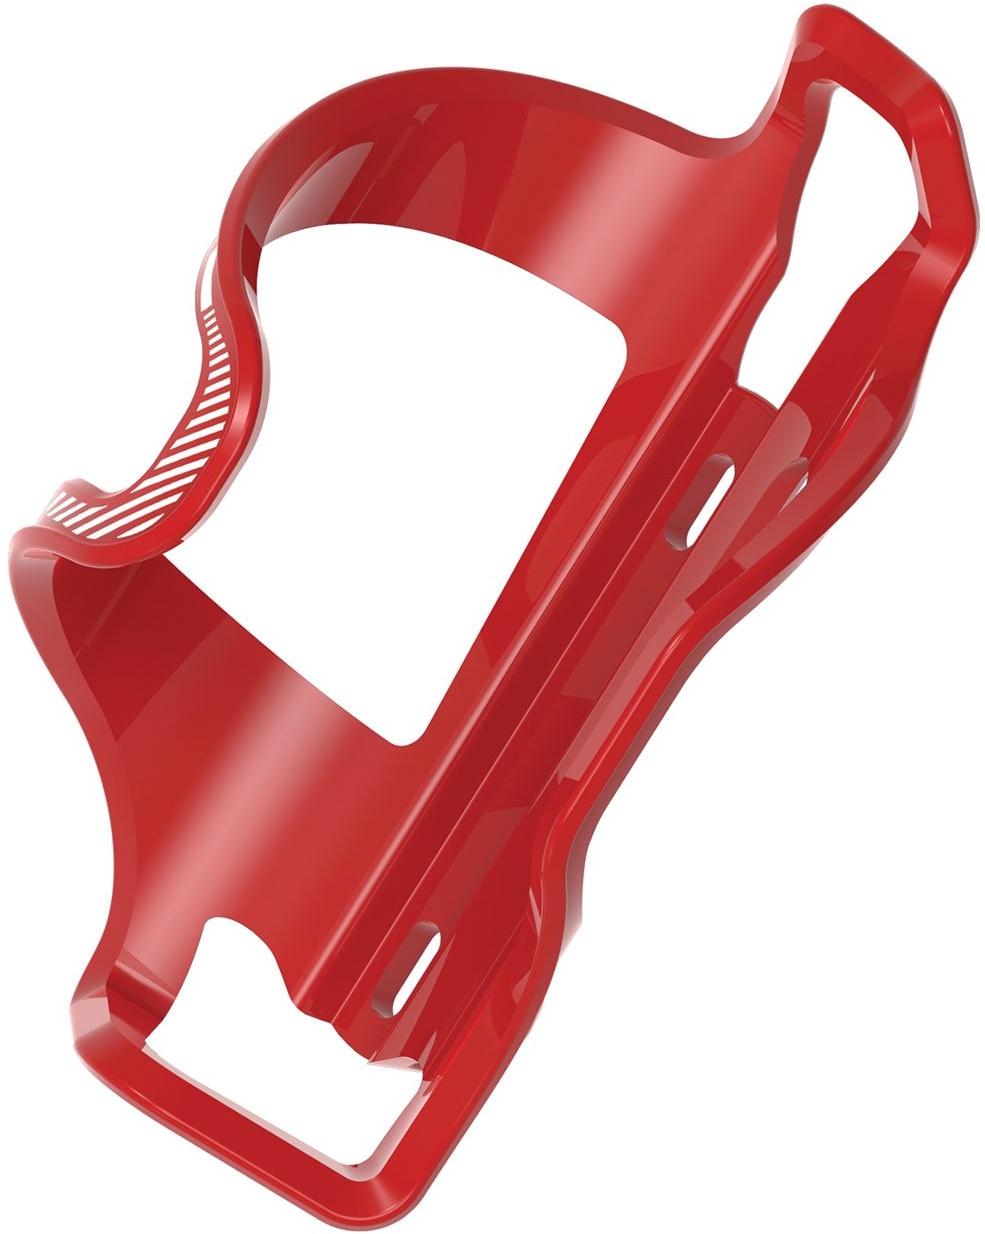 Lezyne Flow Cage Sl - R - Enhanced Red uni